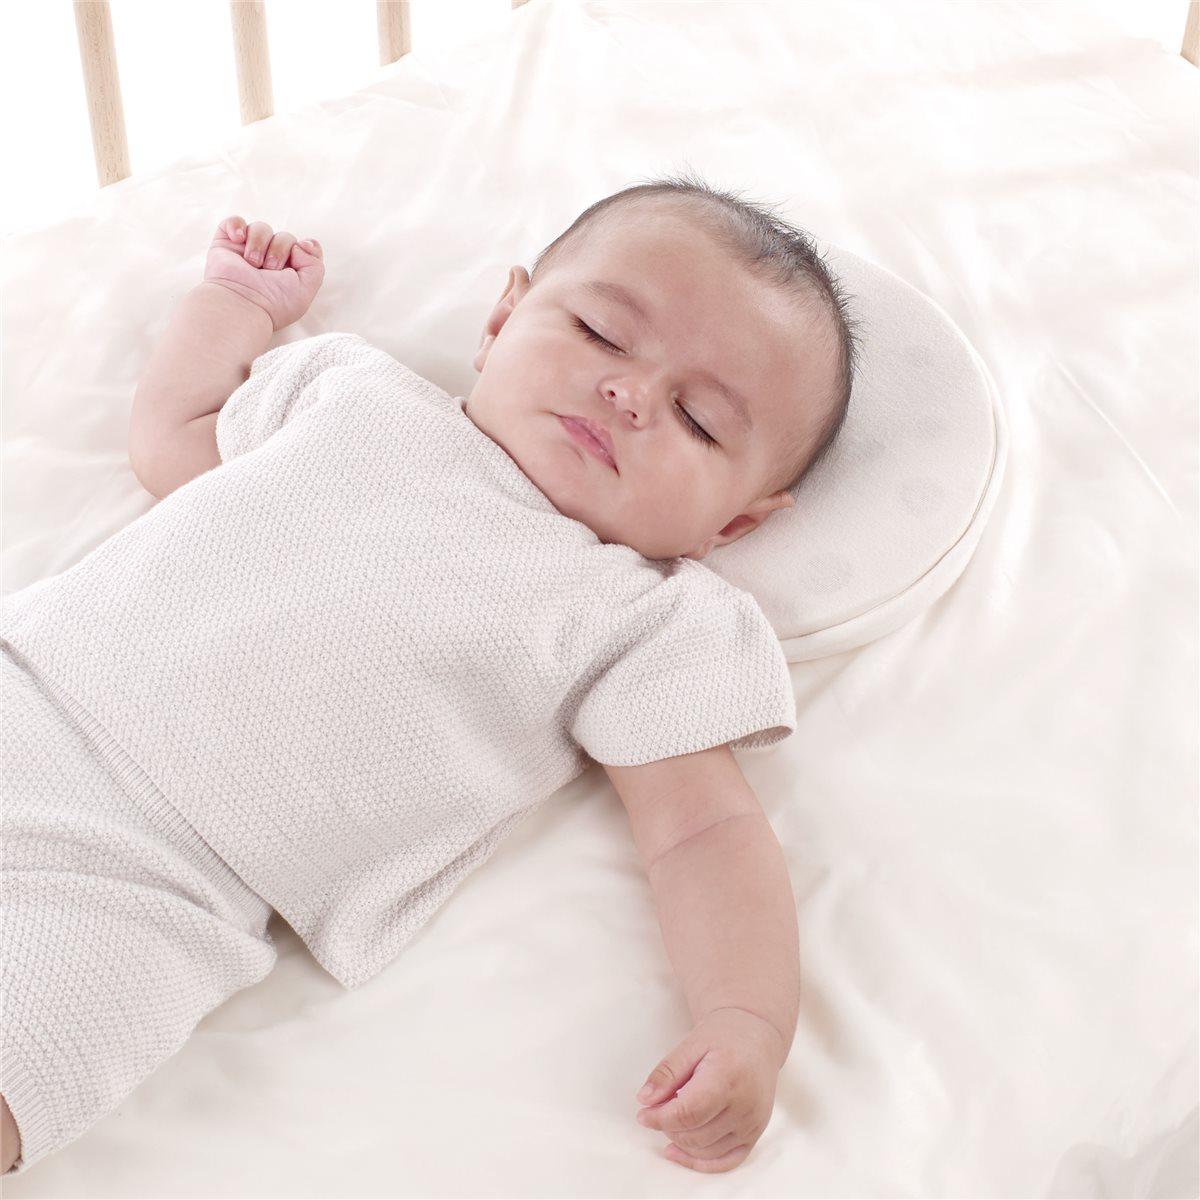 almohada cuna bebé plagiocefalia